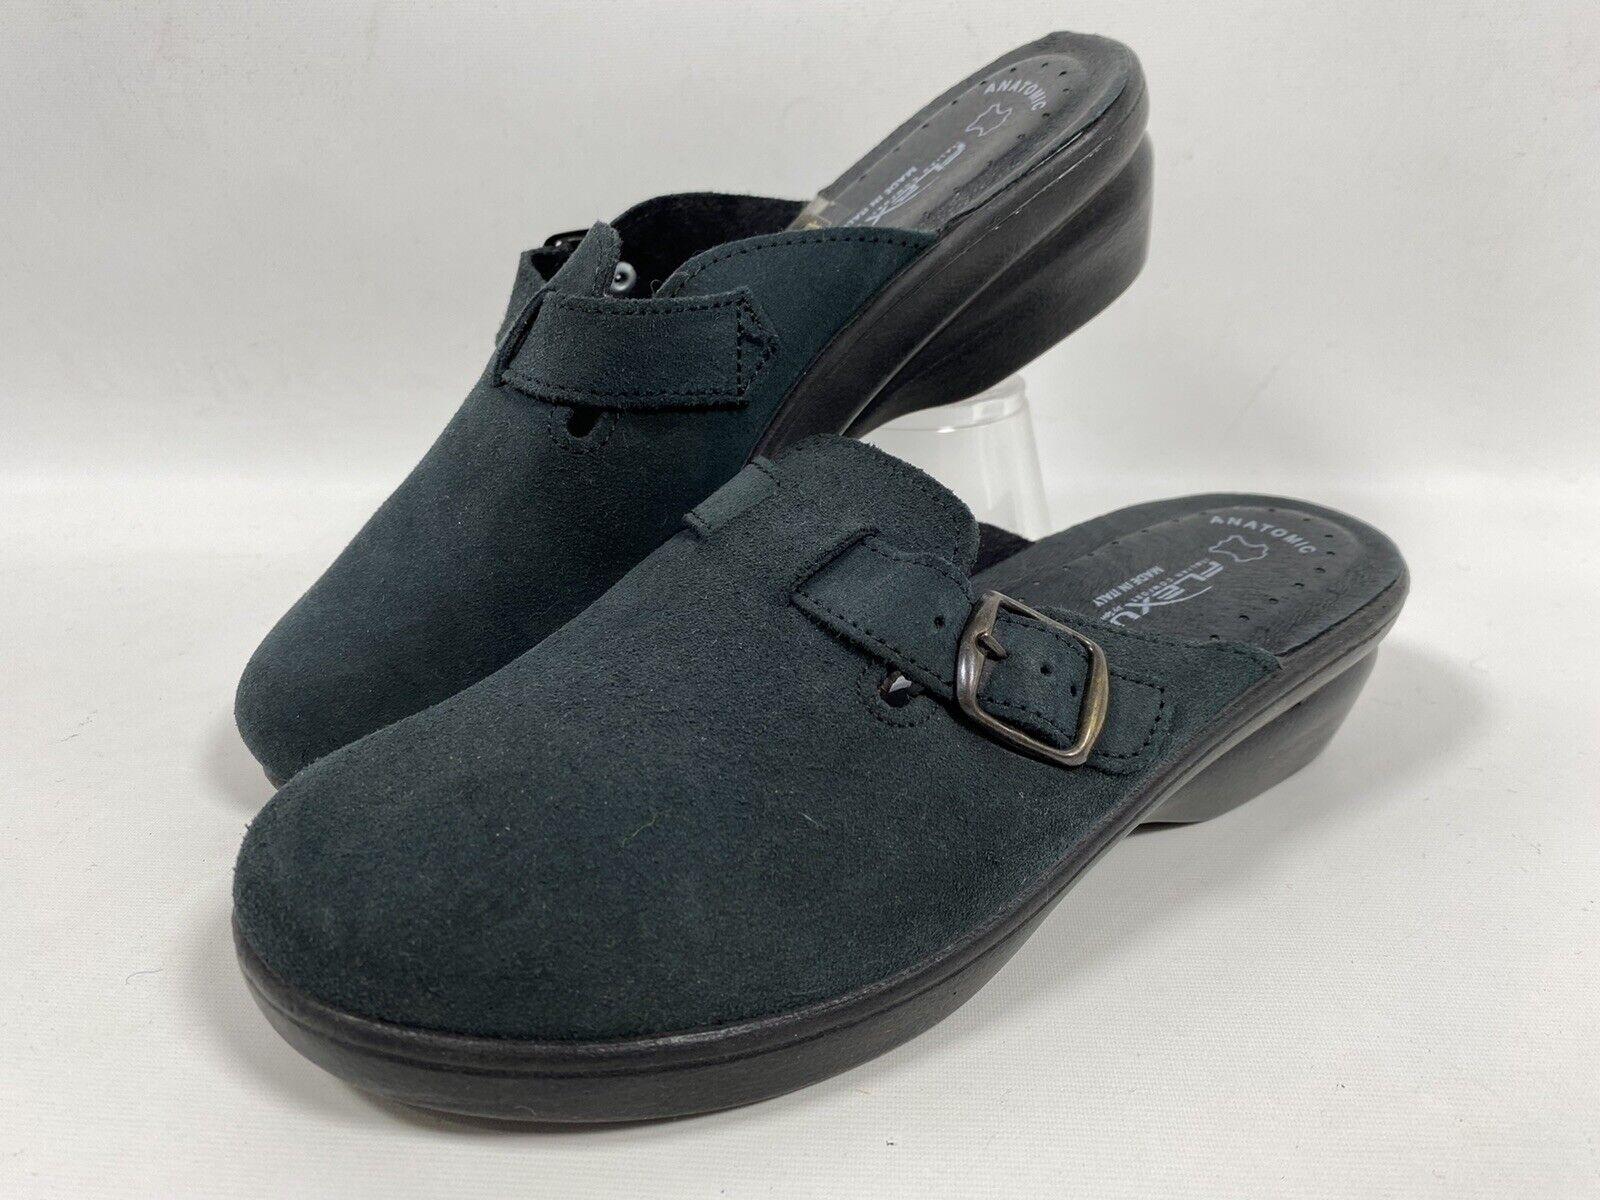 FLEXUS by Spring Step Italian Comfort Clog, Suede, Black, Size 38